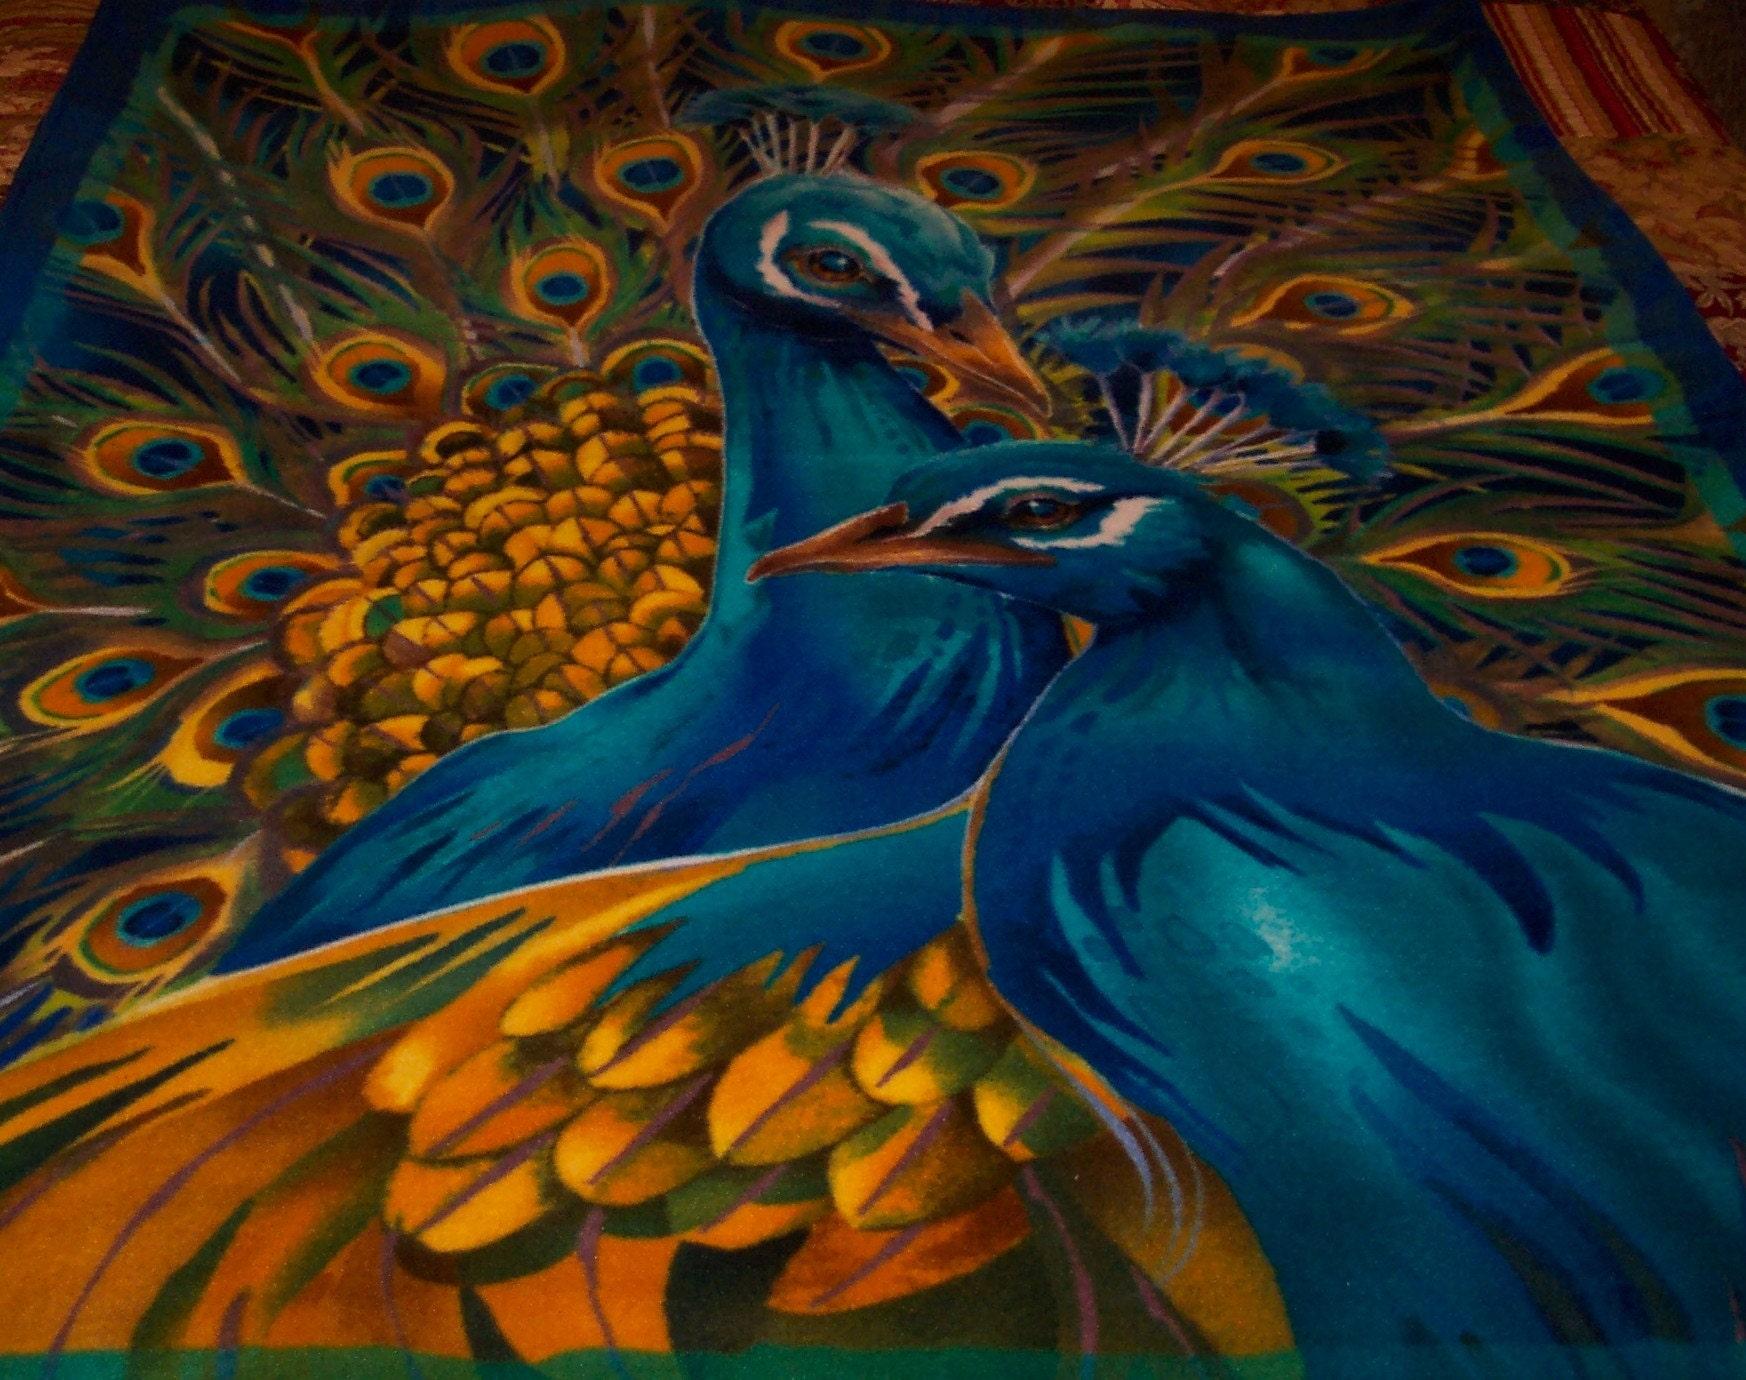 Peacock Fleece Throw Blanket By Mamaandpapadk On Etsy